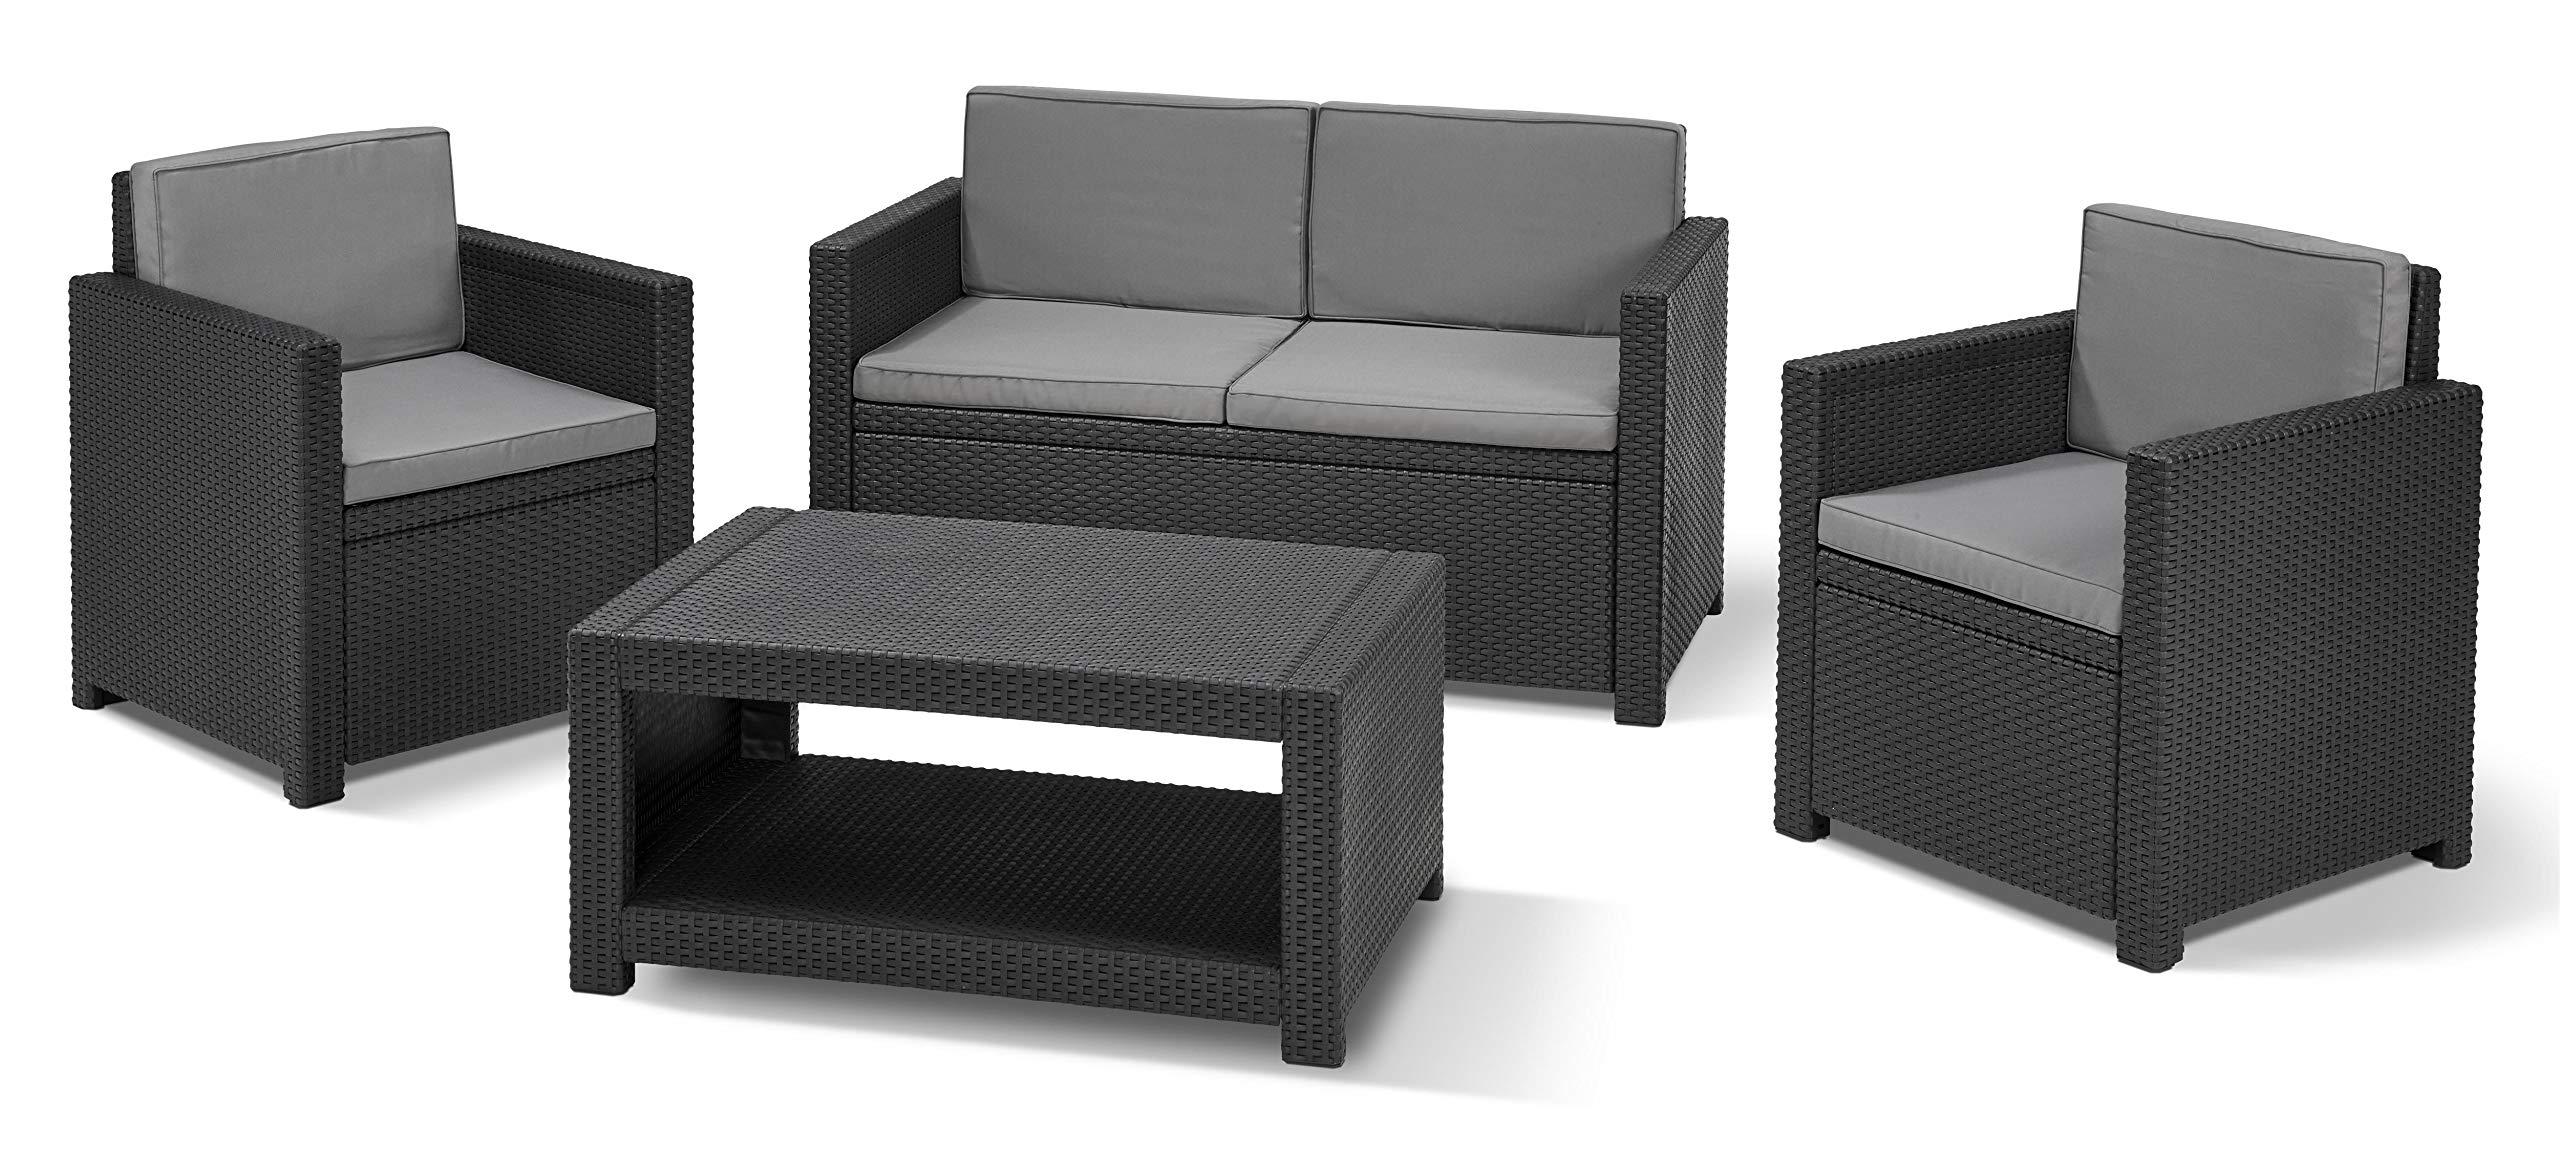 Keter Rattan Style 3 Drawer Cart.Keter Allibert Monaco Outdoor 4 Seater Rattan Lounge Garden